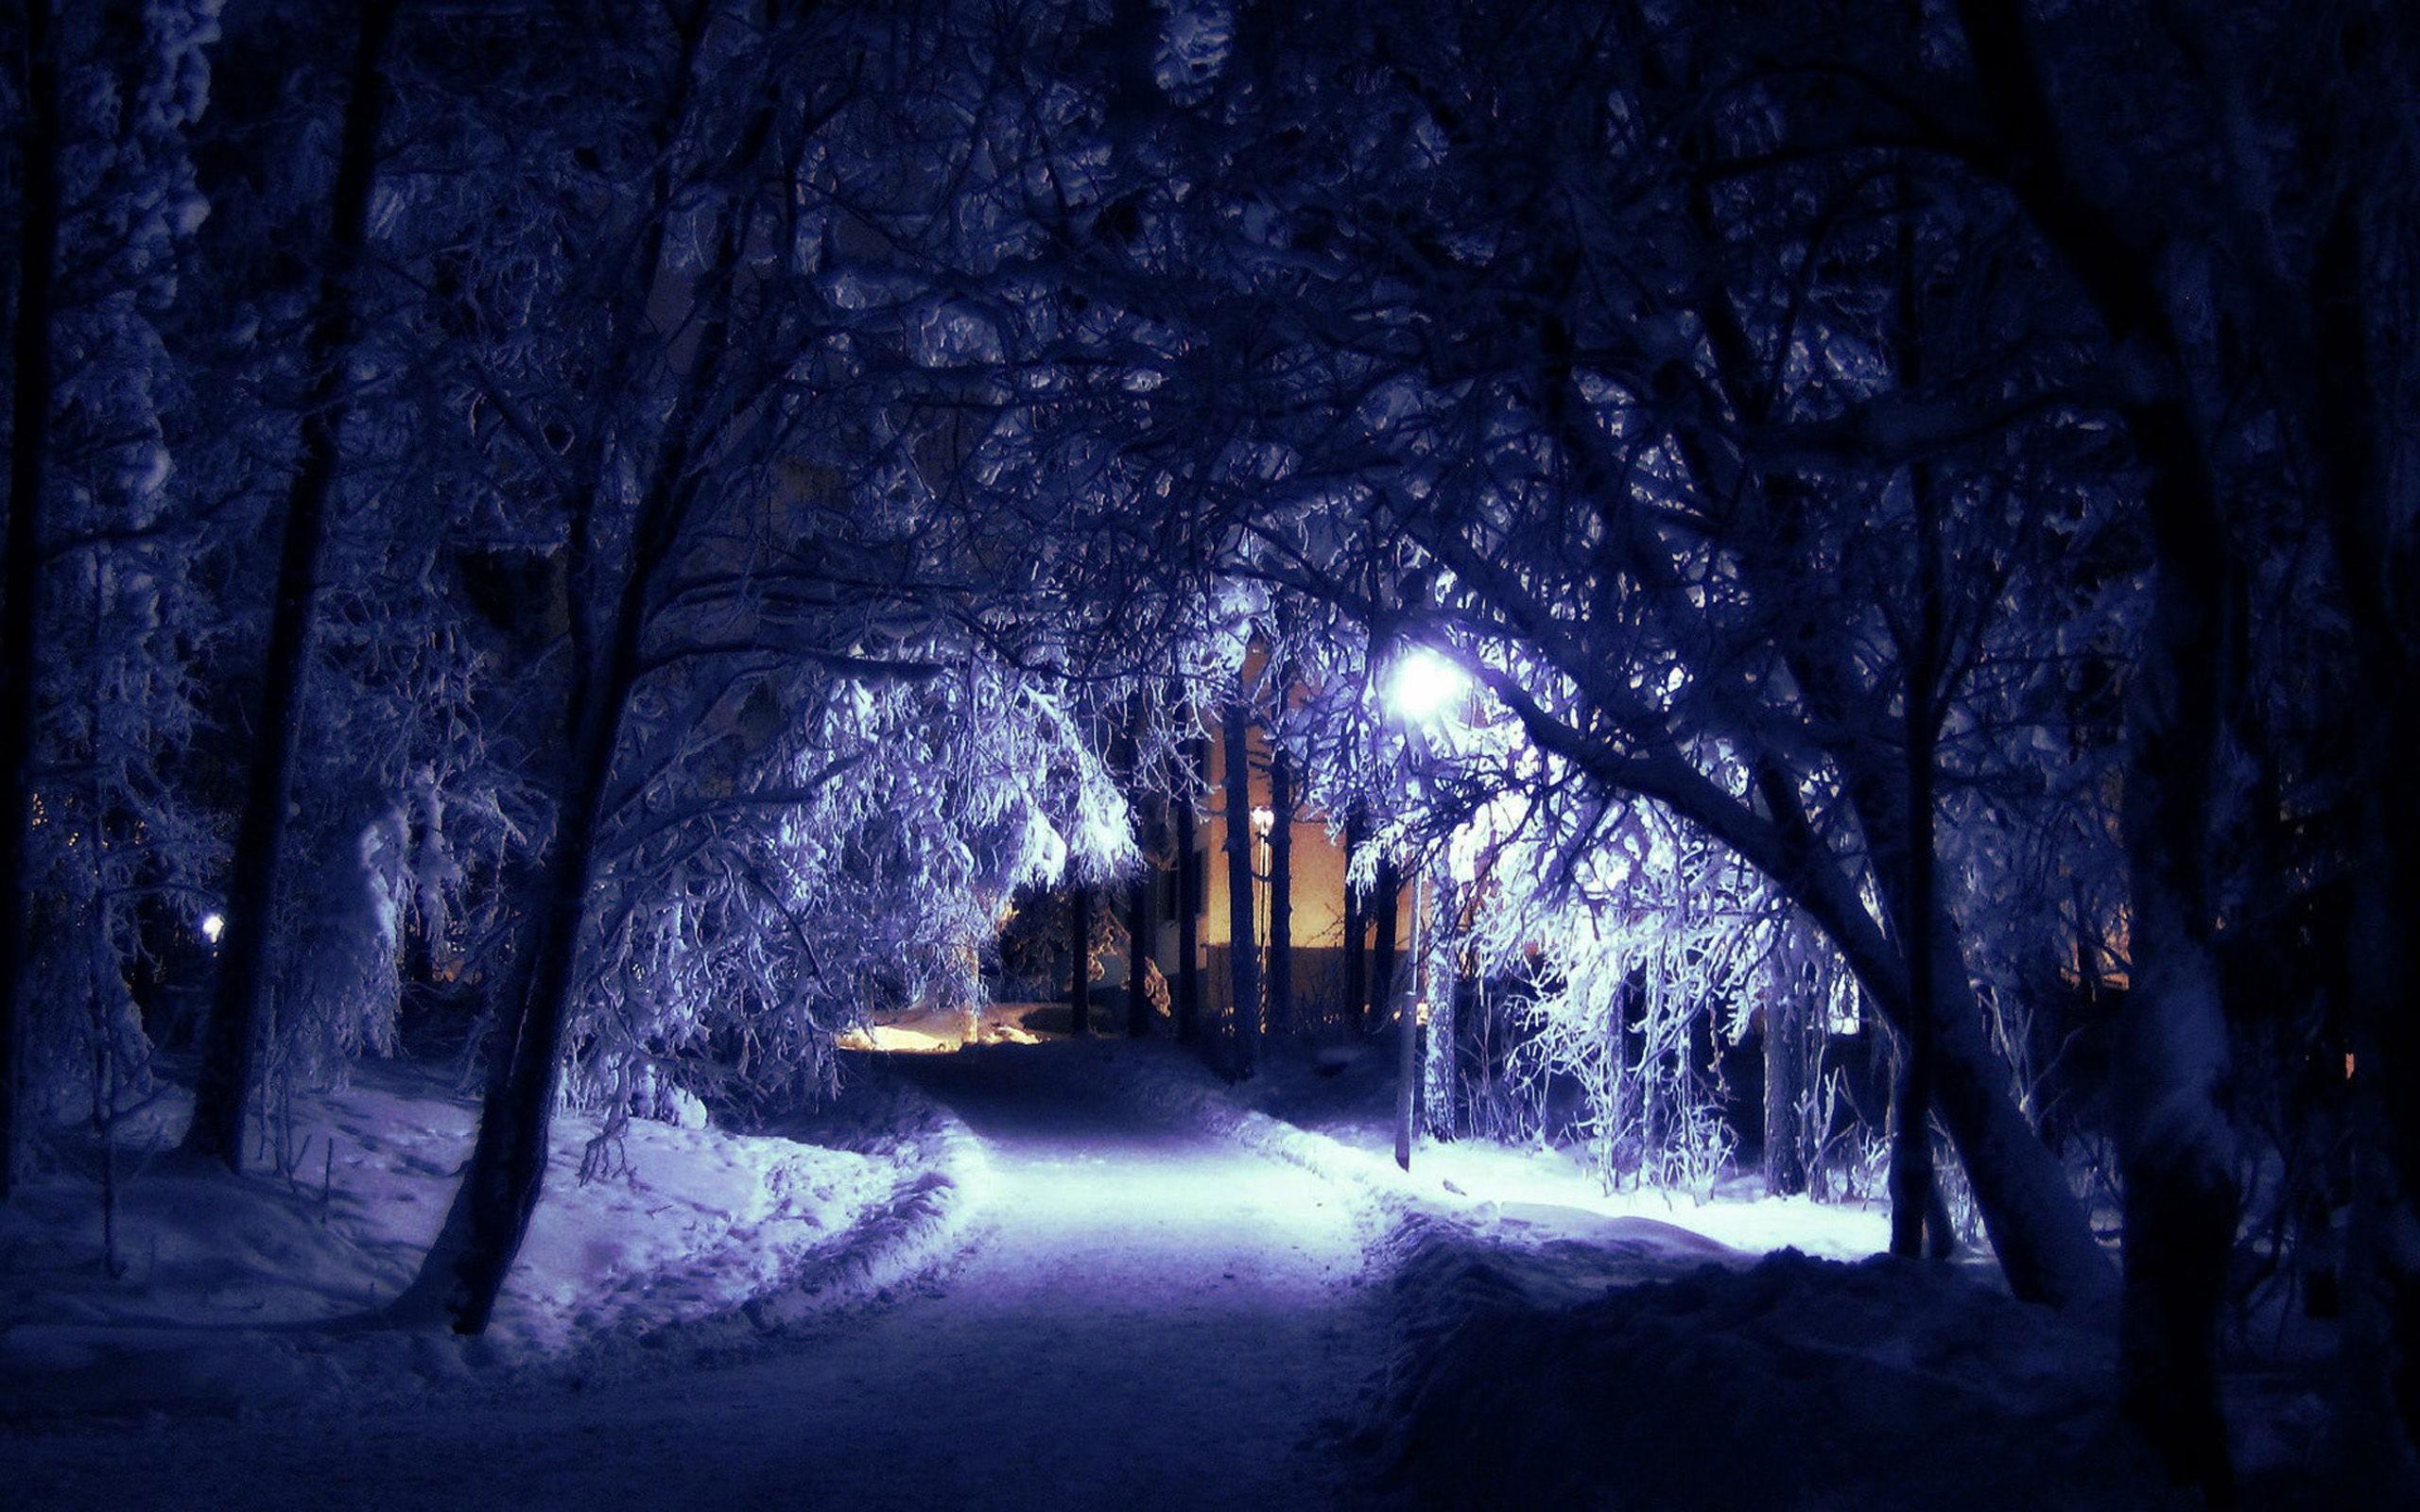 Winter Night HD Desktop Wallpaper   New HD Wallpapers 2560x1600